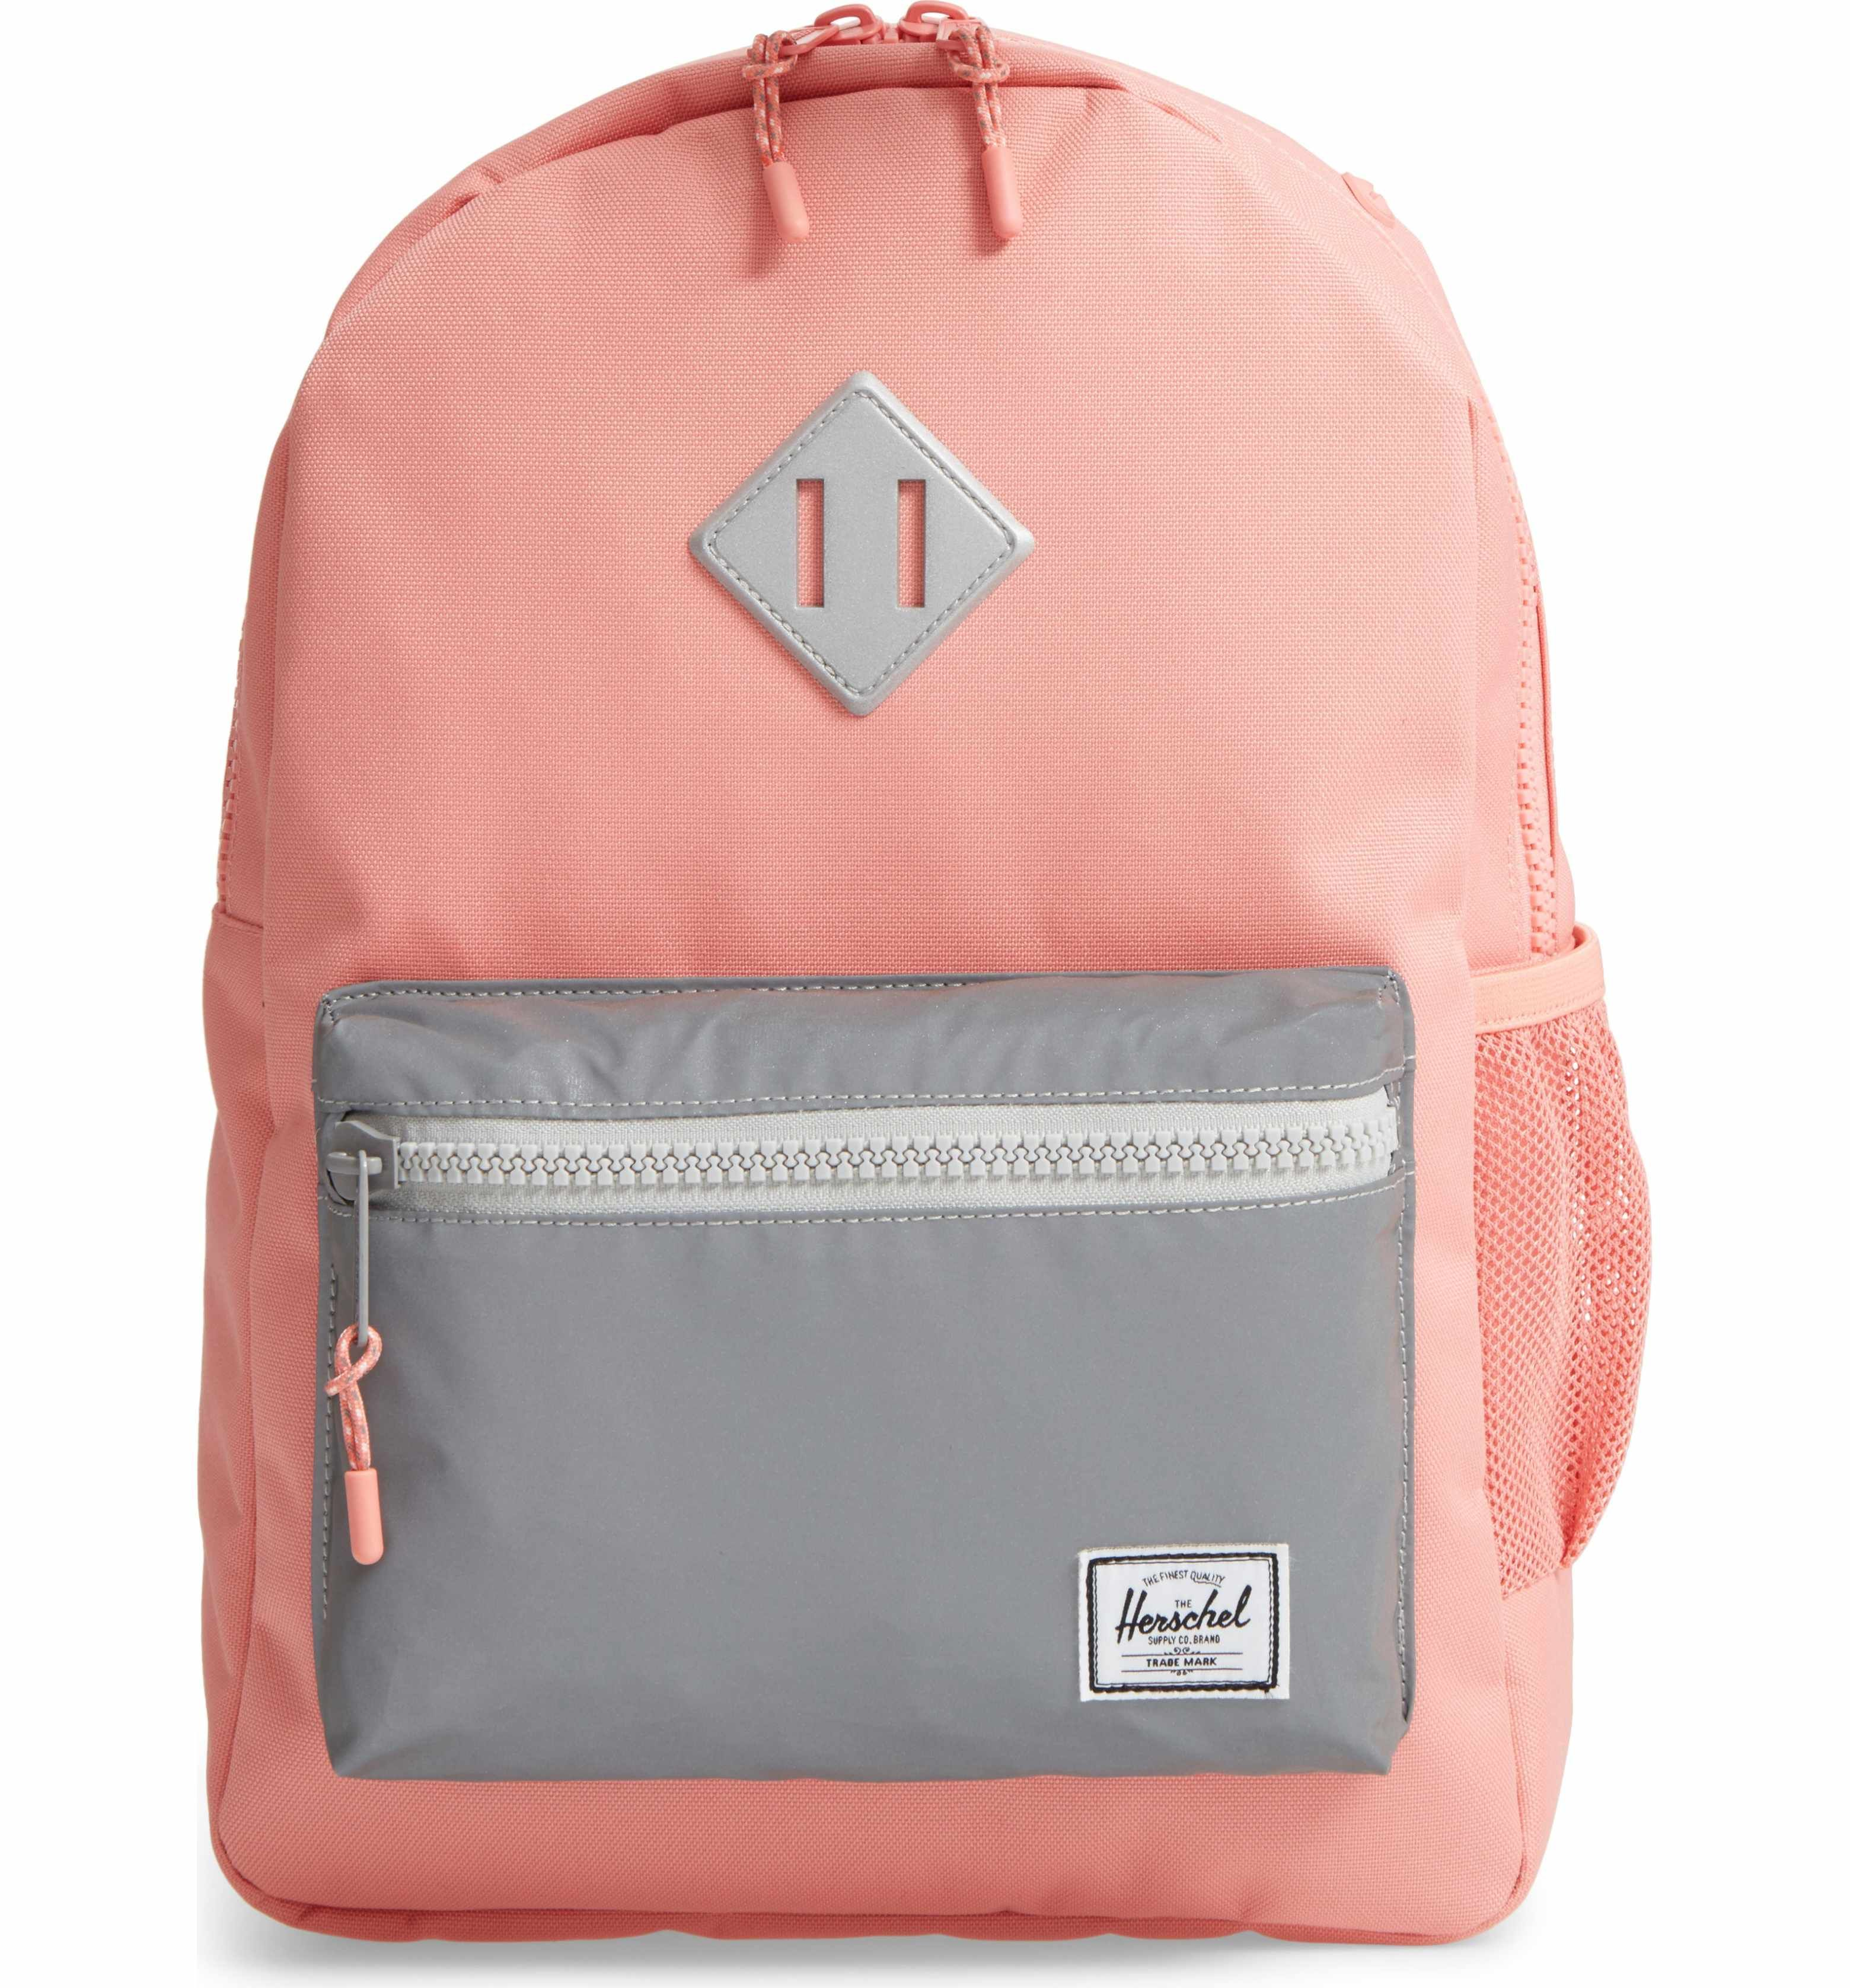 c1567f5131 Main Image - Herschel Supply Co. Heritage Backpack (Kids)